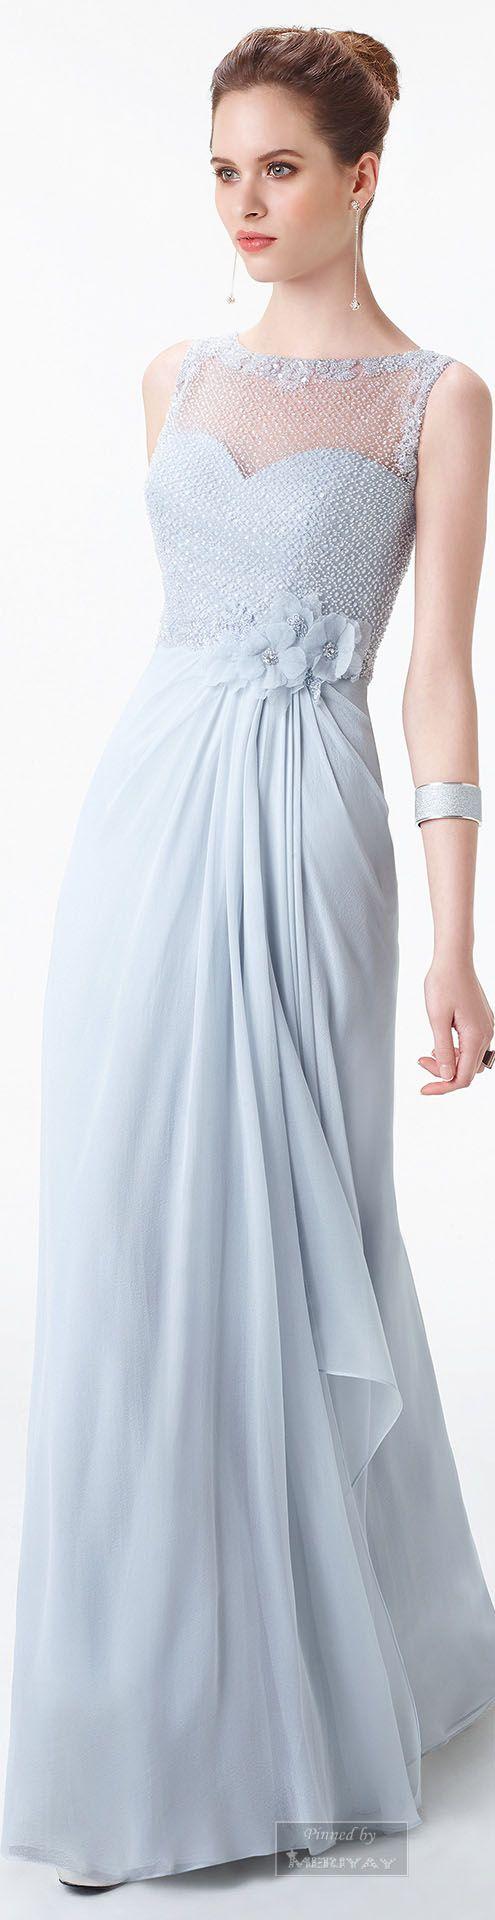 AZUL CLARO....❤ | Party Dress | Pinterest | Azul claro, Azul y ...